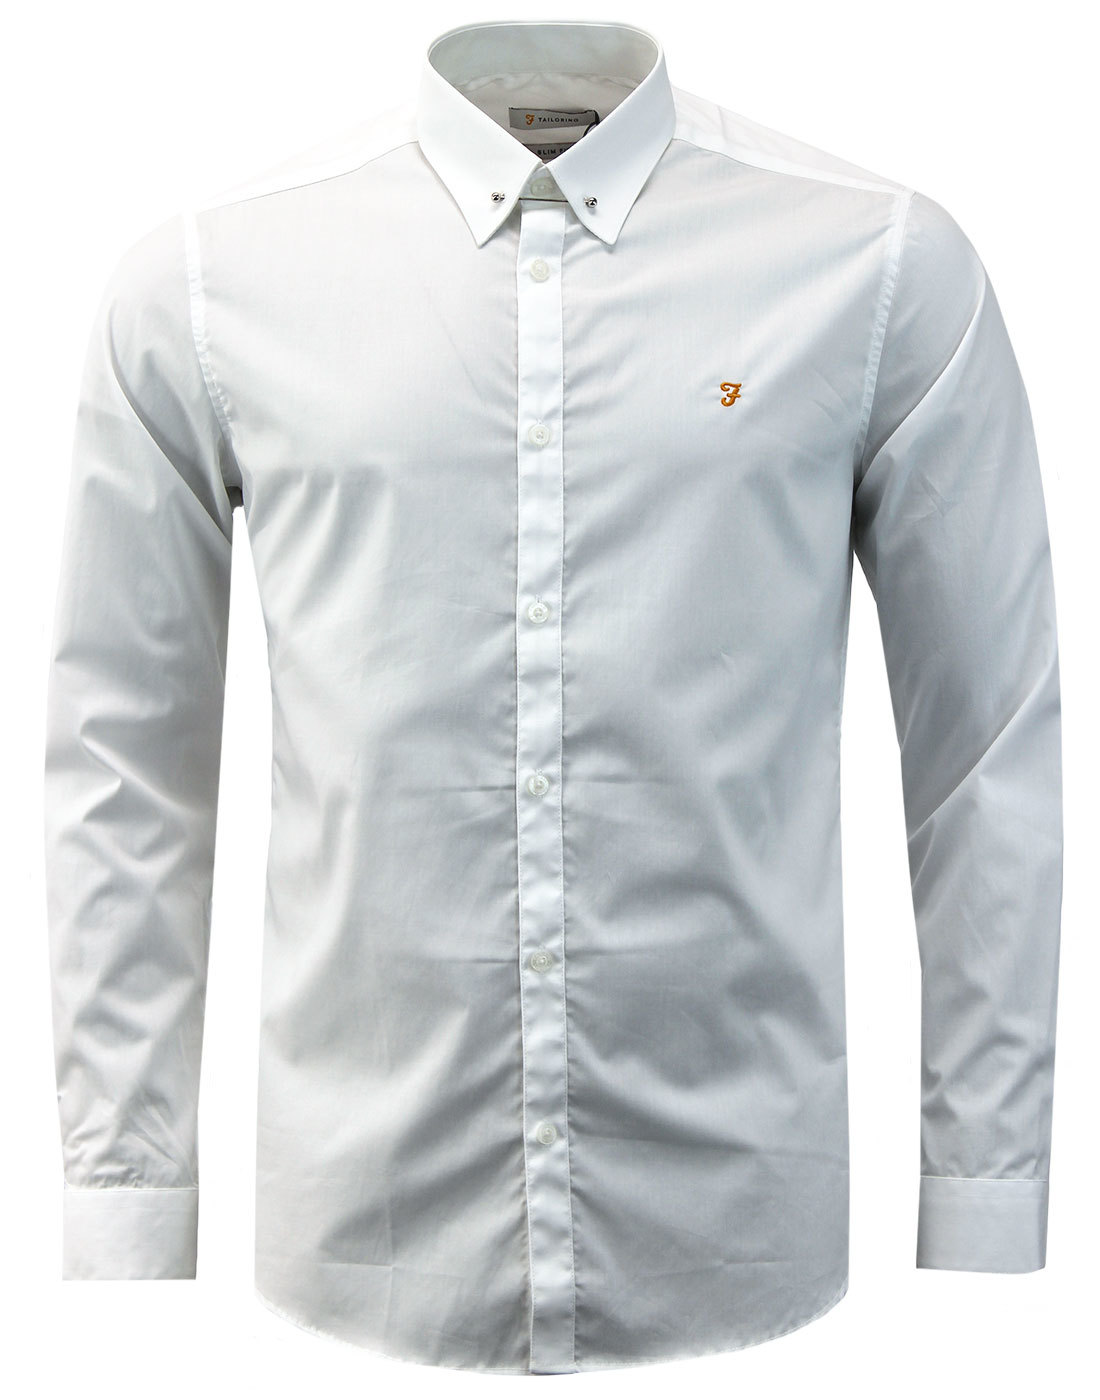 Handford FARAH Mens Mod Bar Collar Smart Shirt (W)